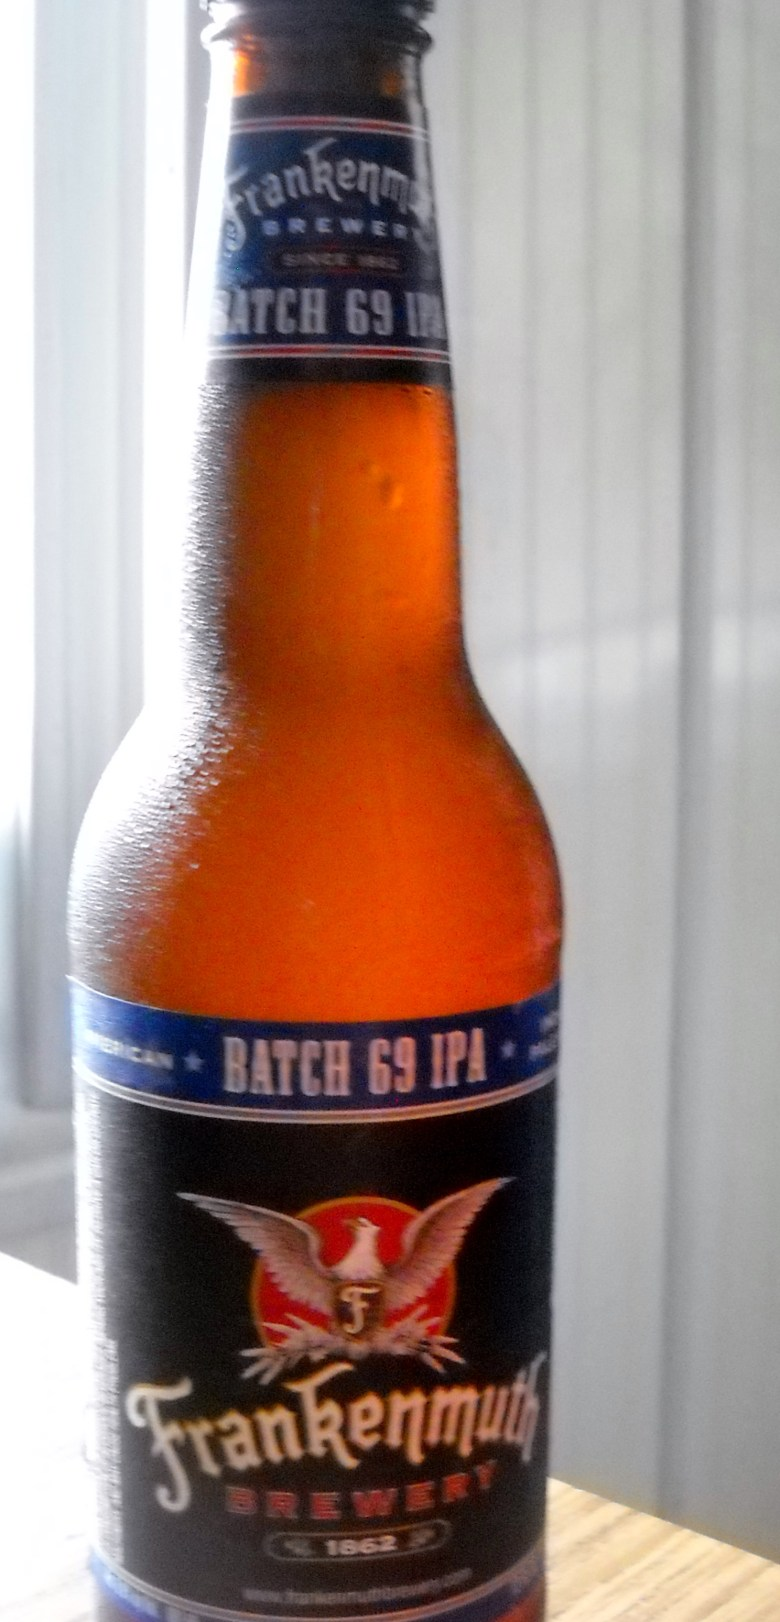 Beer blog: Frankenmuth Batch 169 IPA